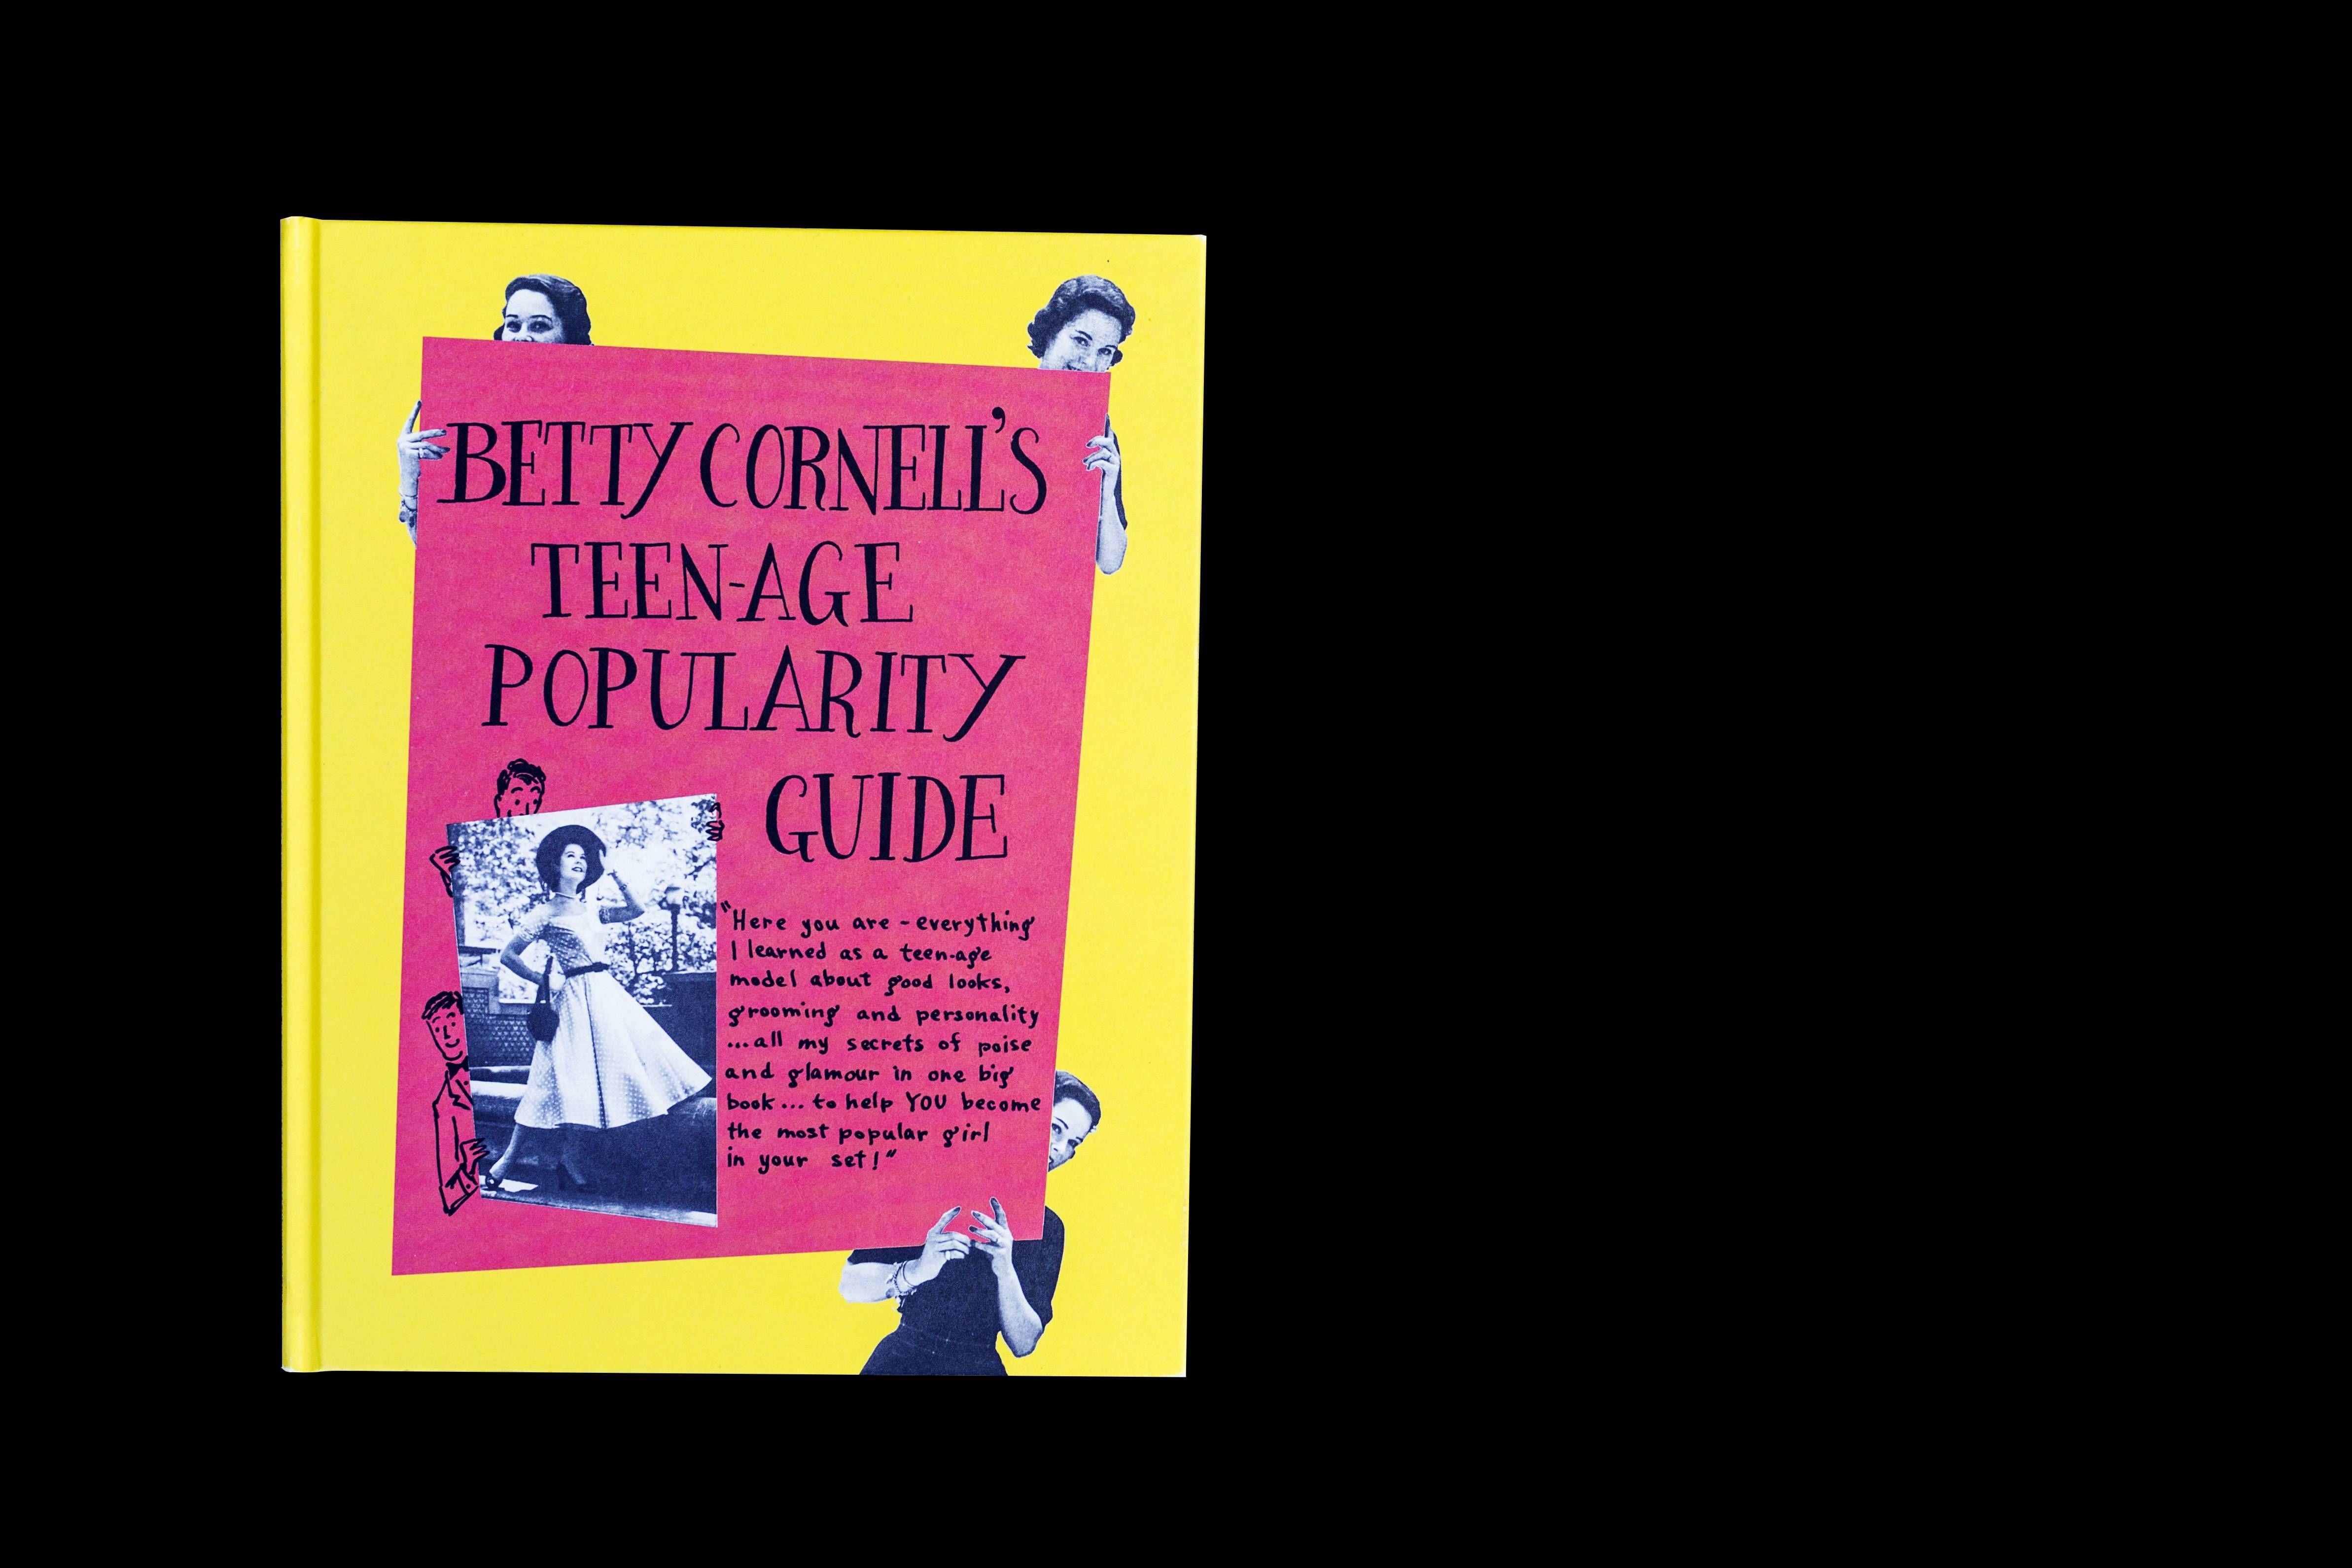 teenage Dating foreldre guide dating dagbøker Toronto Star